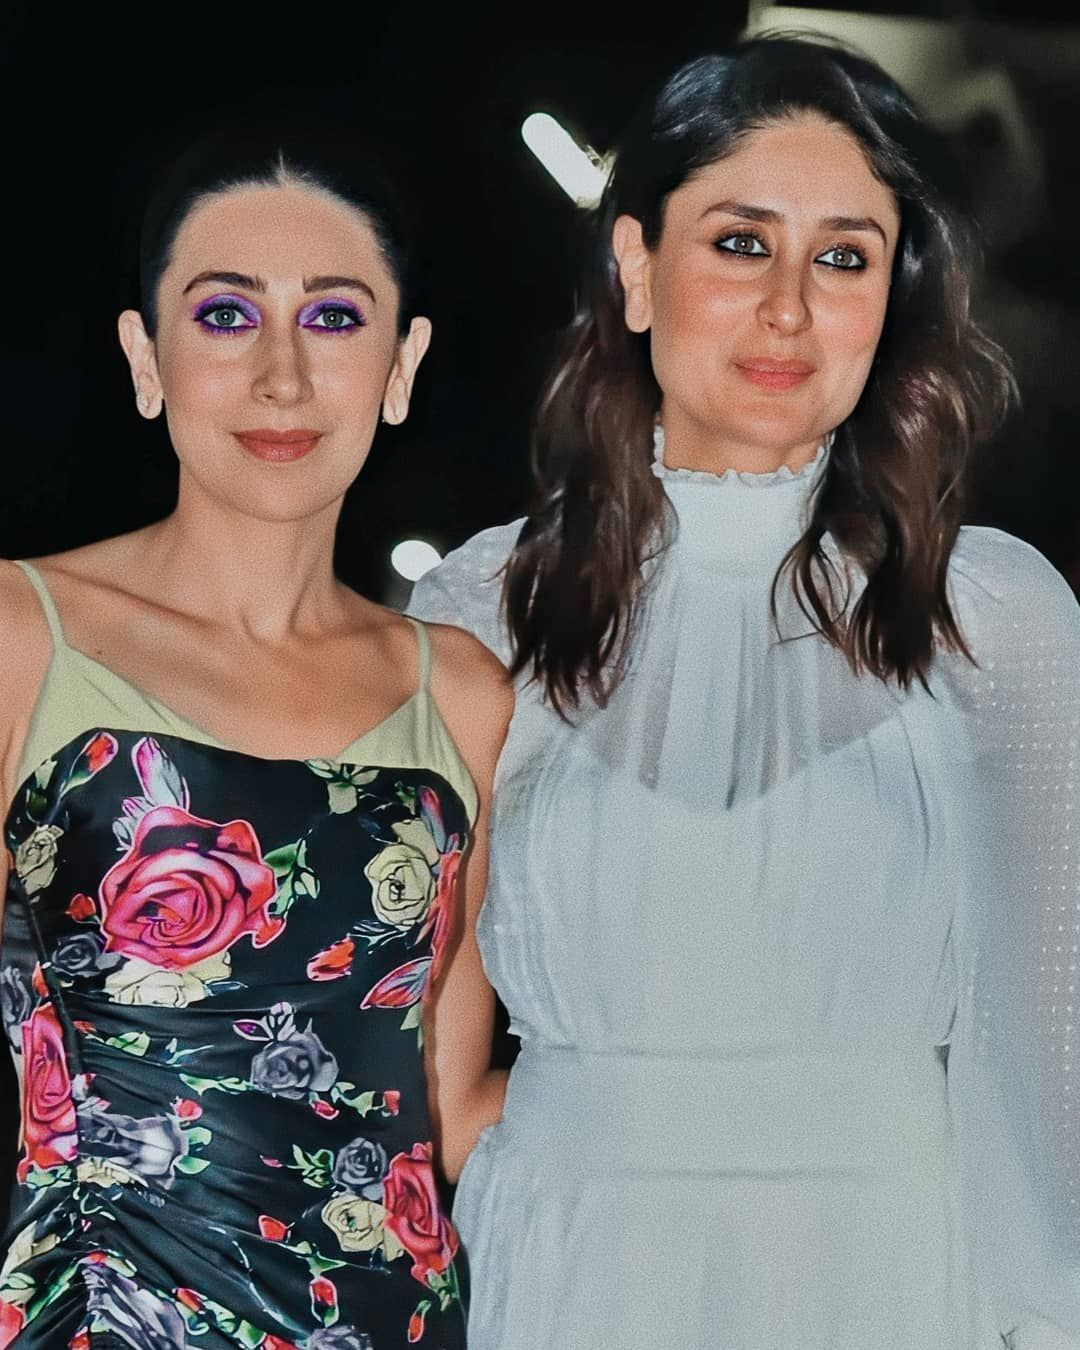 Kareena Kapoor And Her Mother Babita Kapoor Turn Up To Support Karishma Kapoor For Screening Of Mentalhood Hungryboo Kareena Kapoor Kareena Kapoor Khan Mother